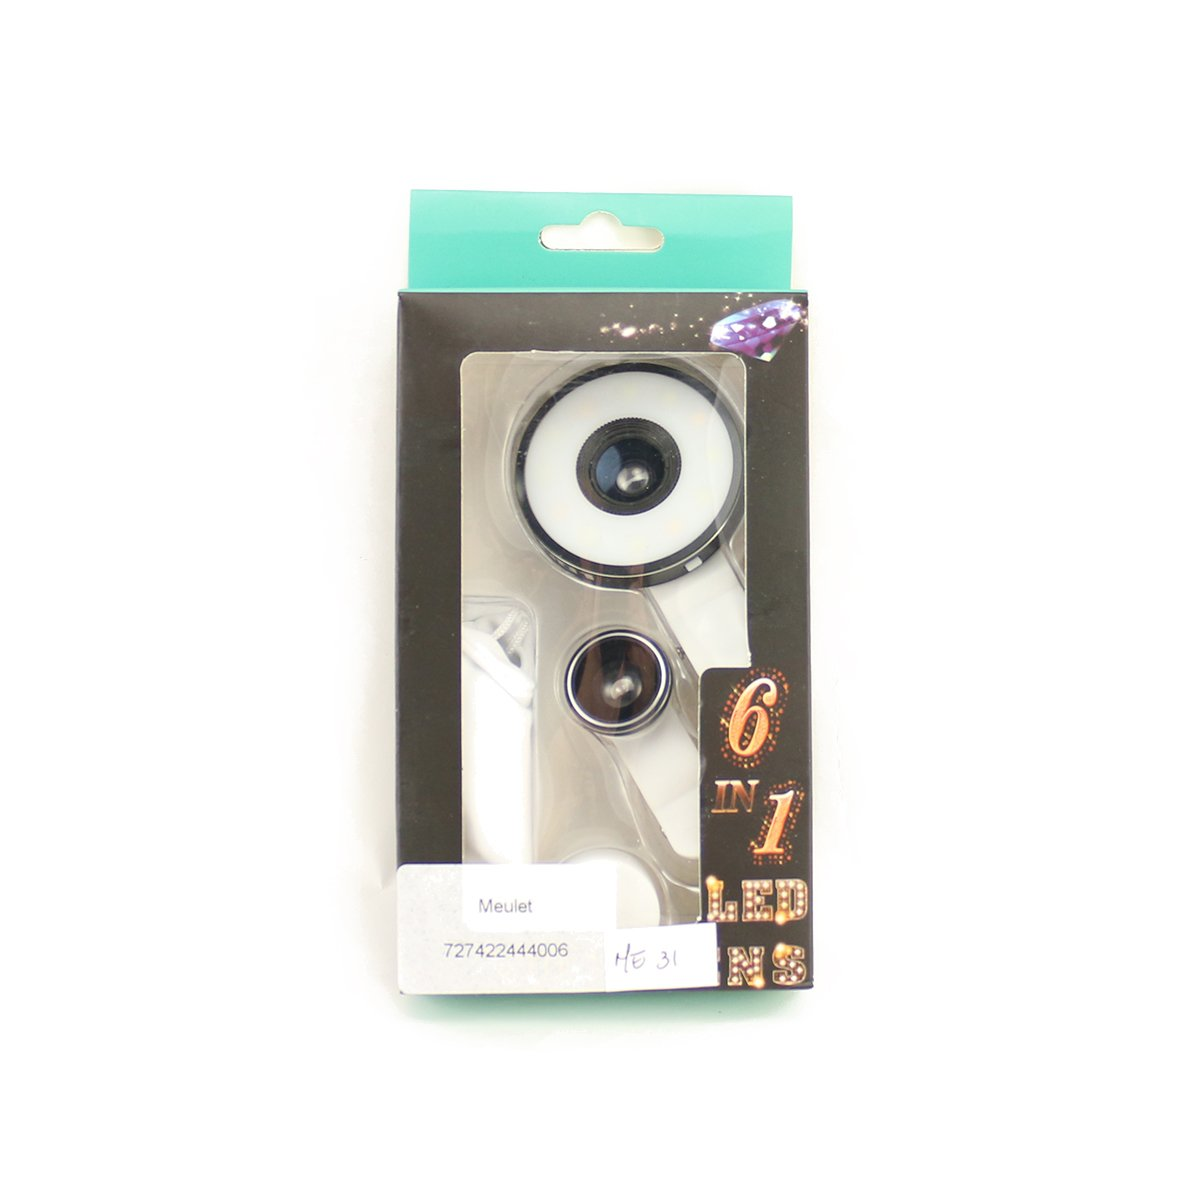 hot sale 2017 6 in 1 Multi LED Lens 185° Fish Eye Lens + 0.65X Wide Angle + 10X Macro Universal Clip Black Color Meulet